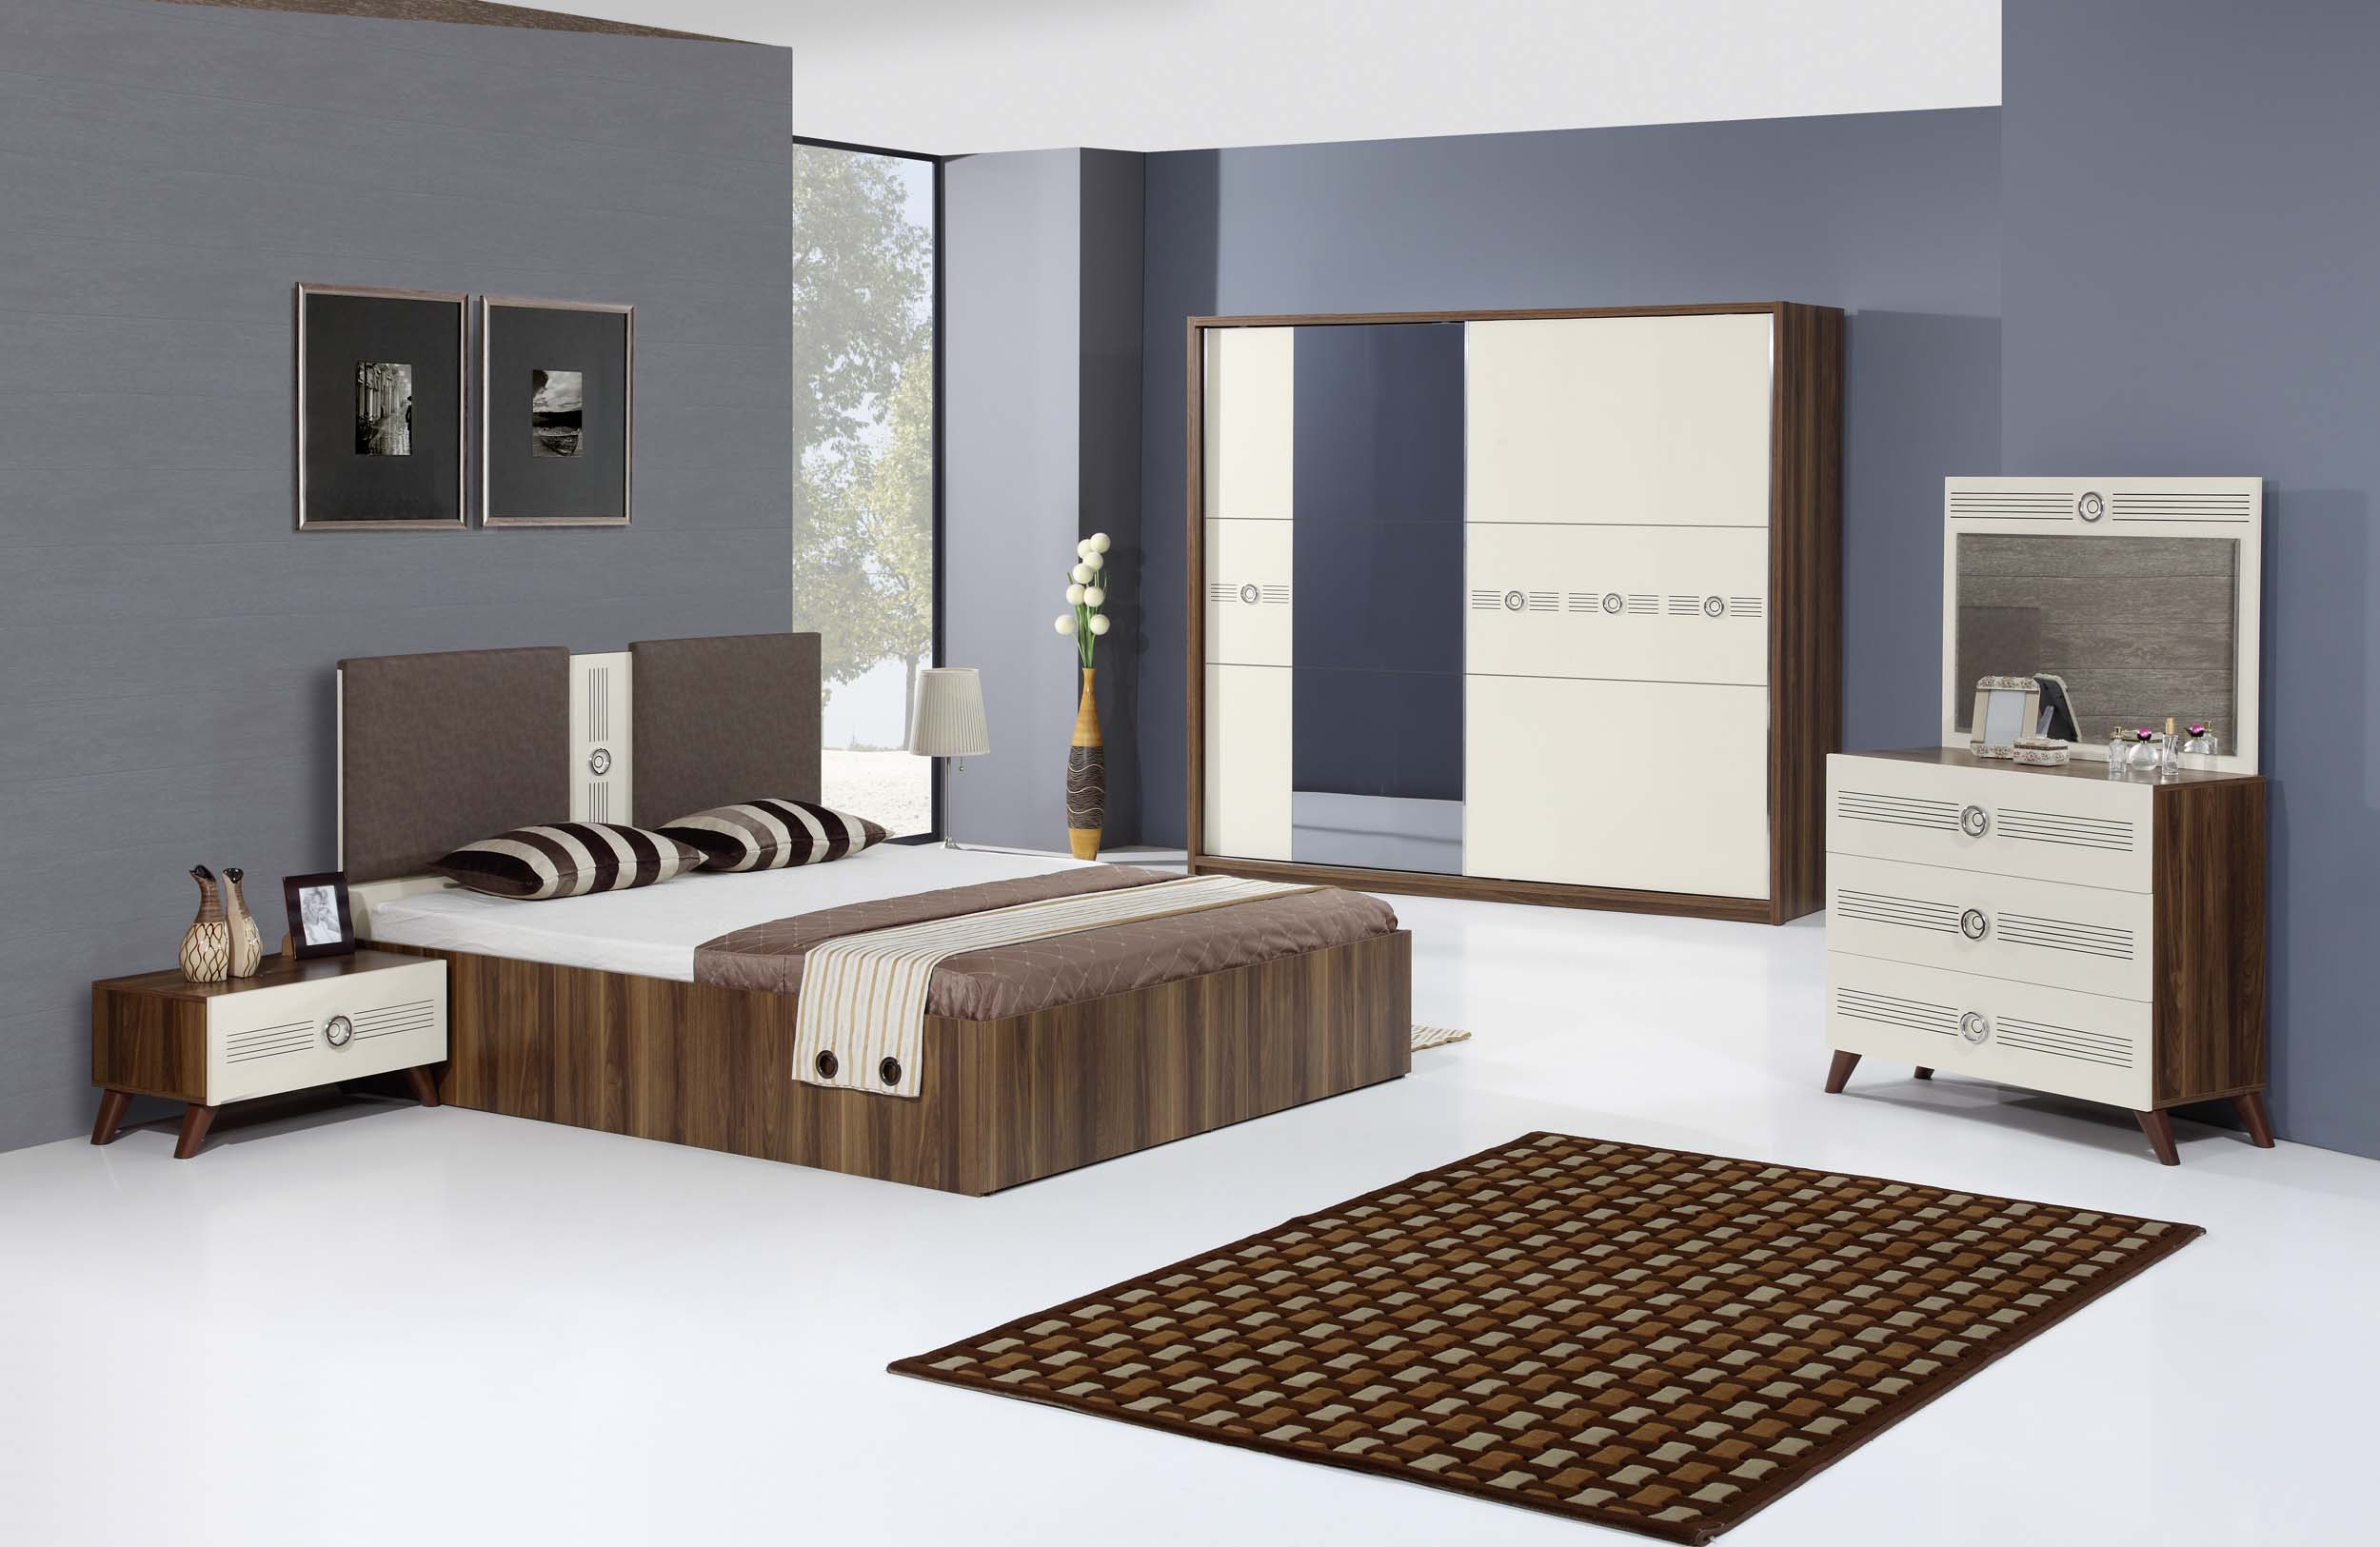 polo schlafzimmer yuvam m belhaus in wuppertal cilek offizieller h ndler in europa. Black Bedroom Furniture Sets. Home Design Ideas